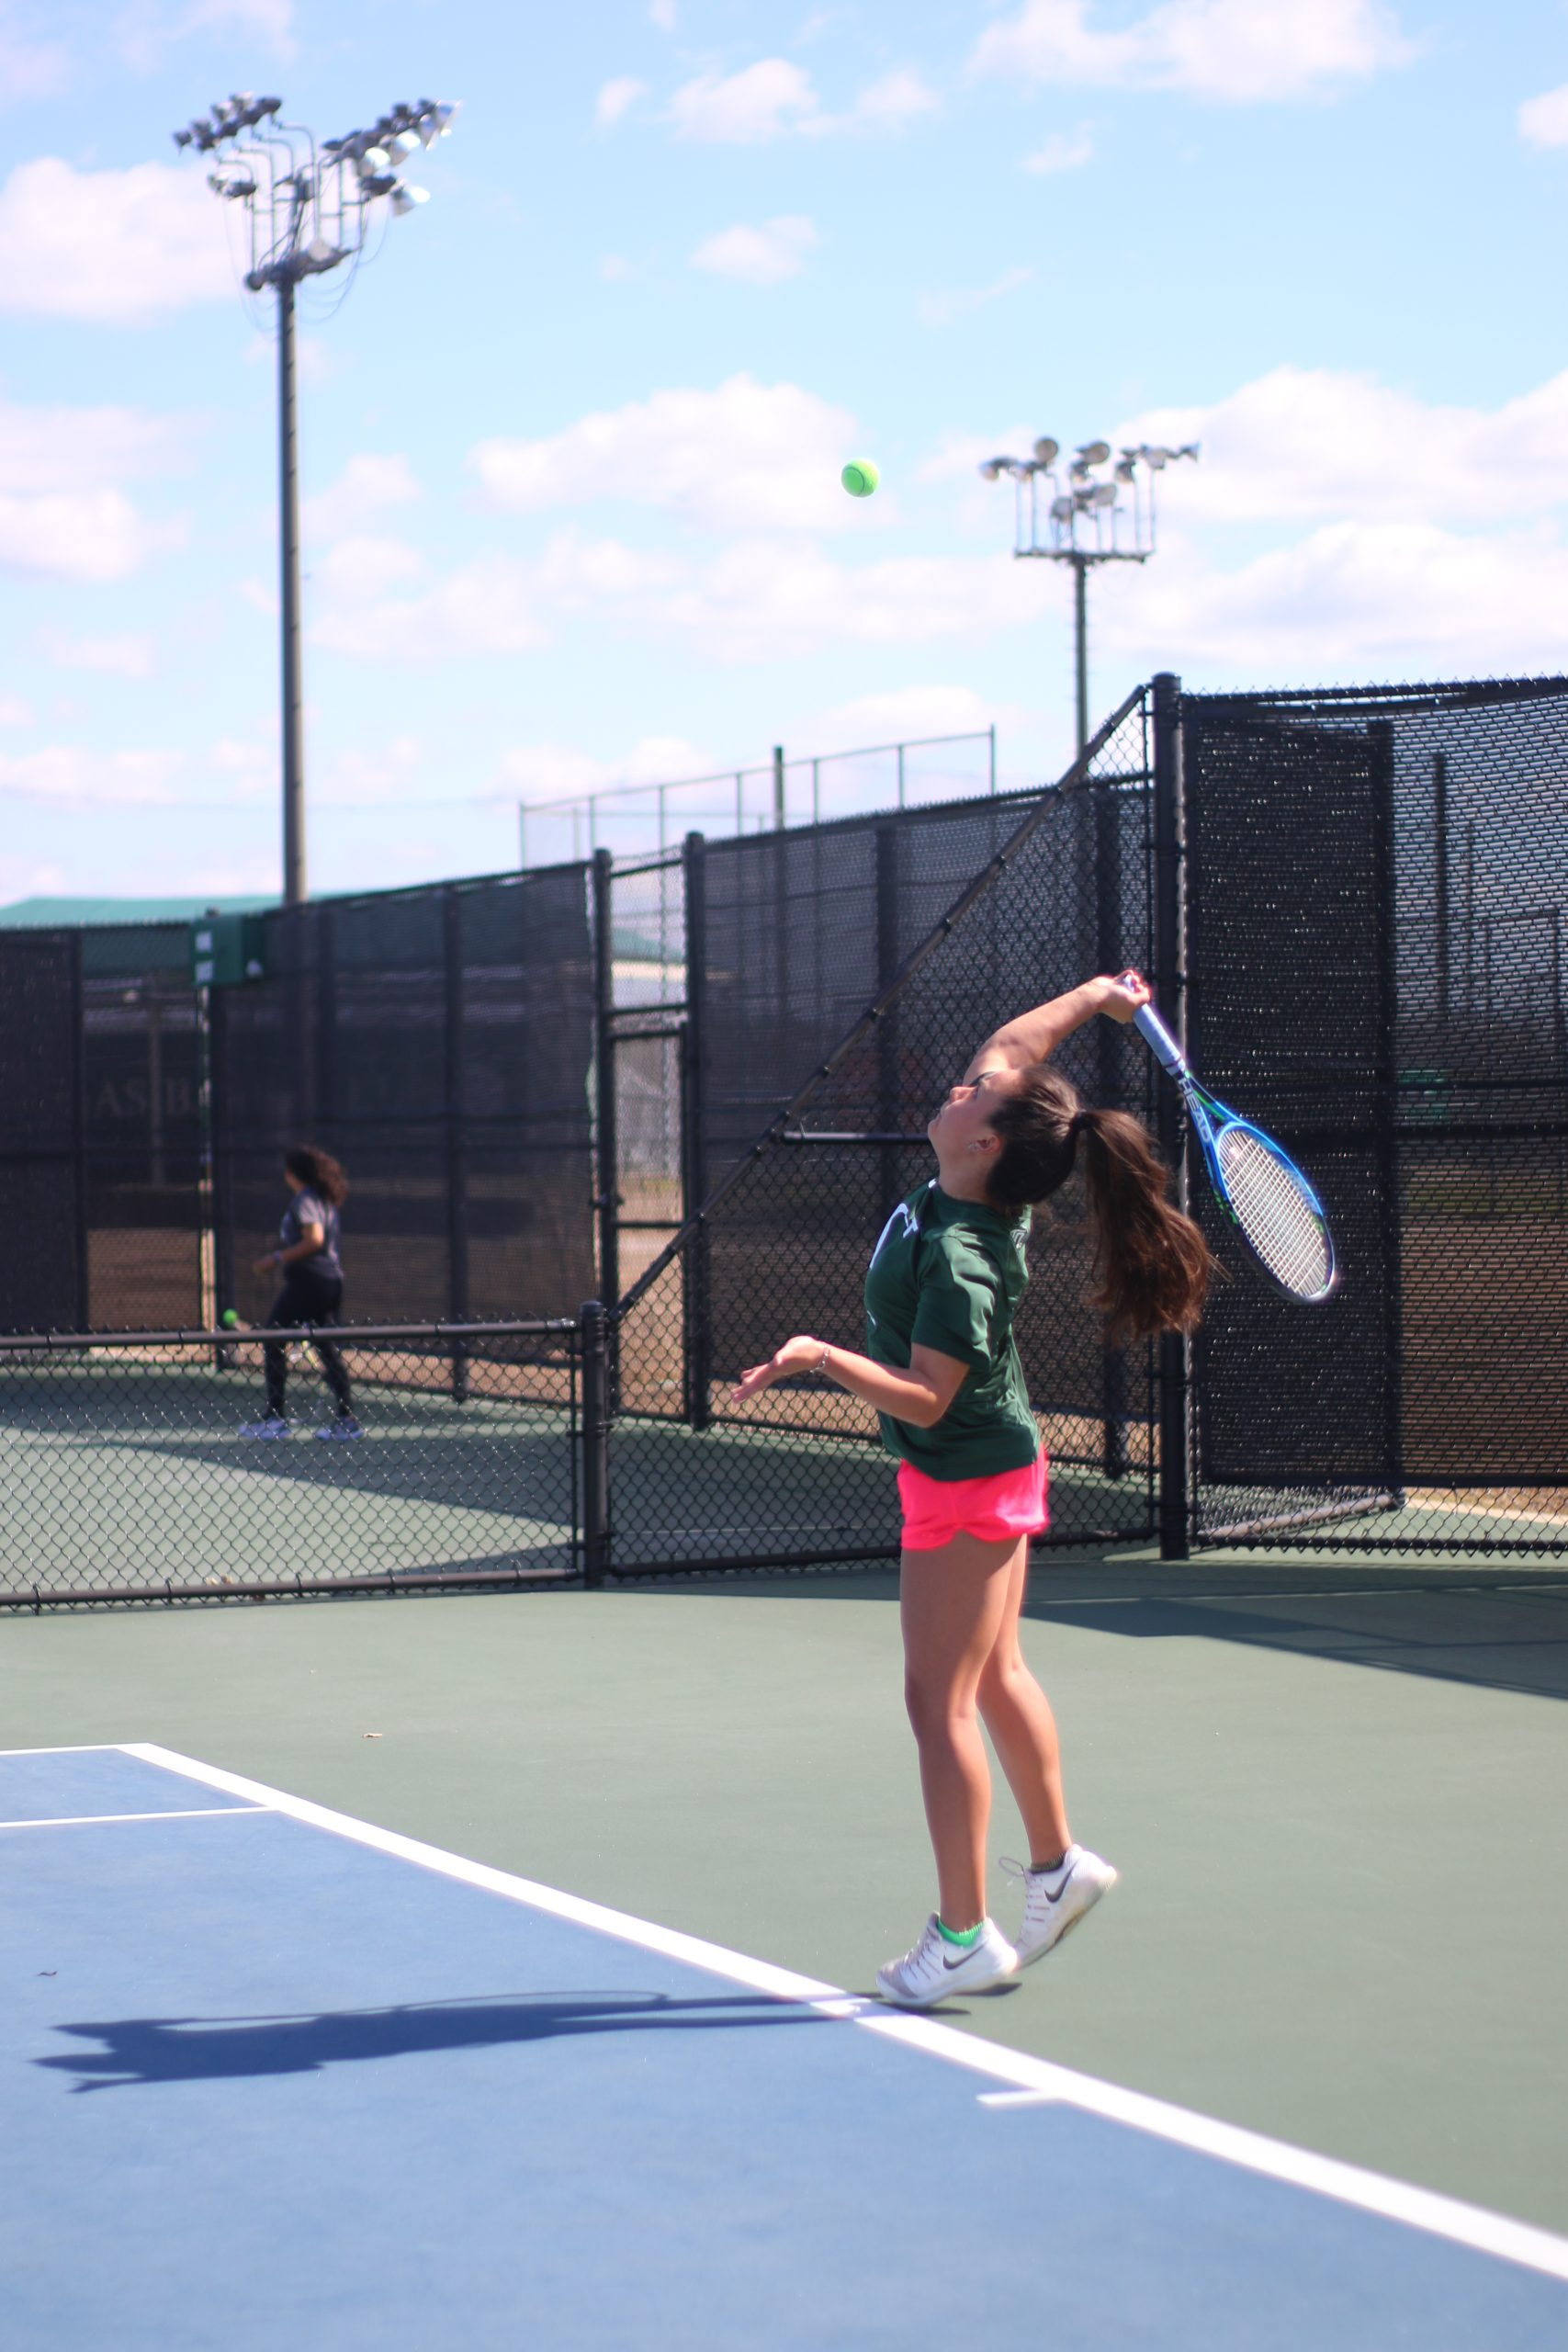 UREC provides alternative to group intramural sports